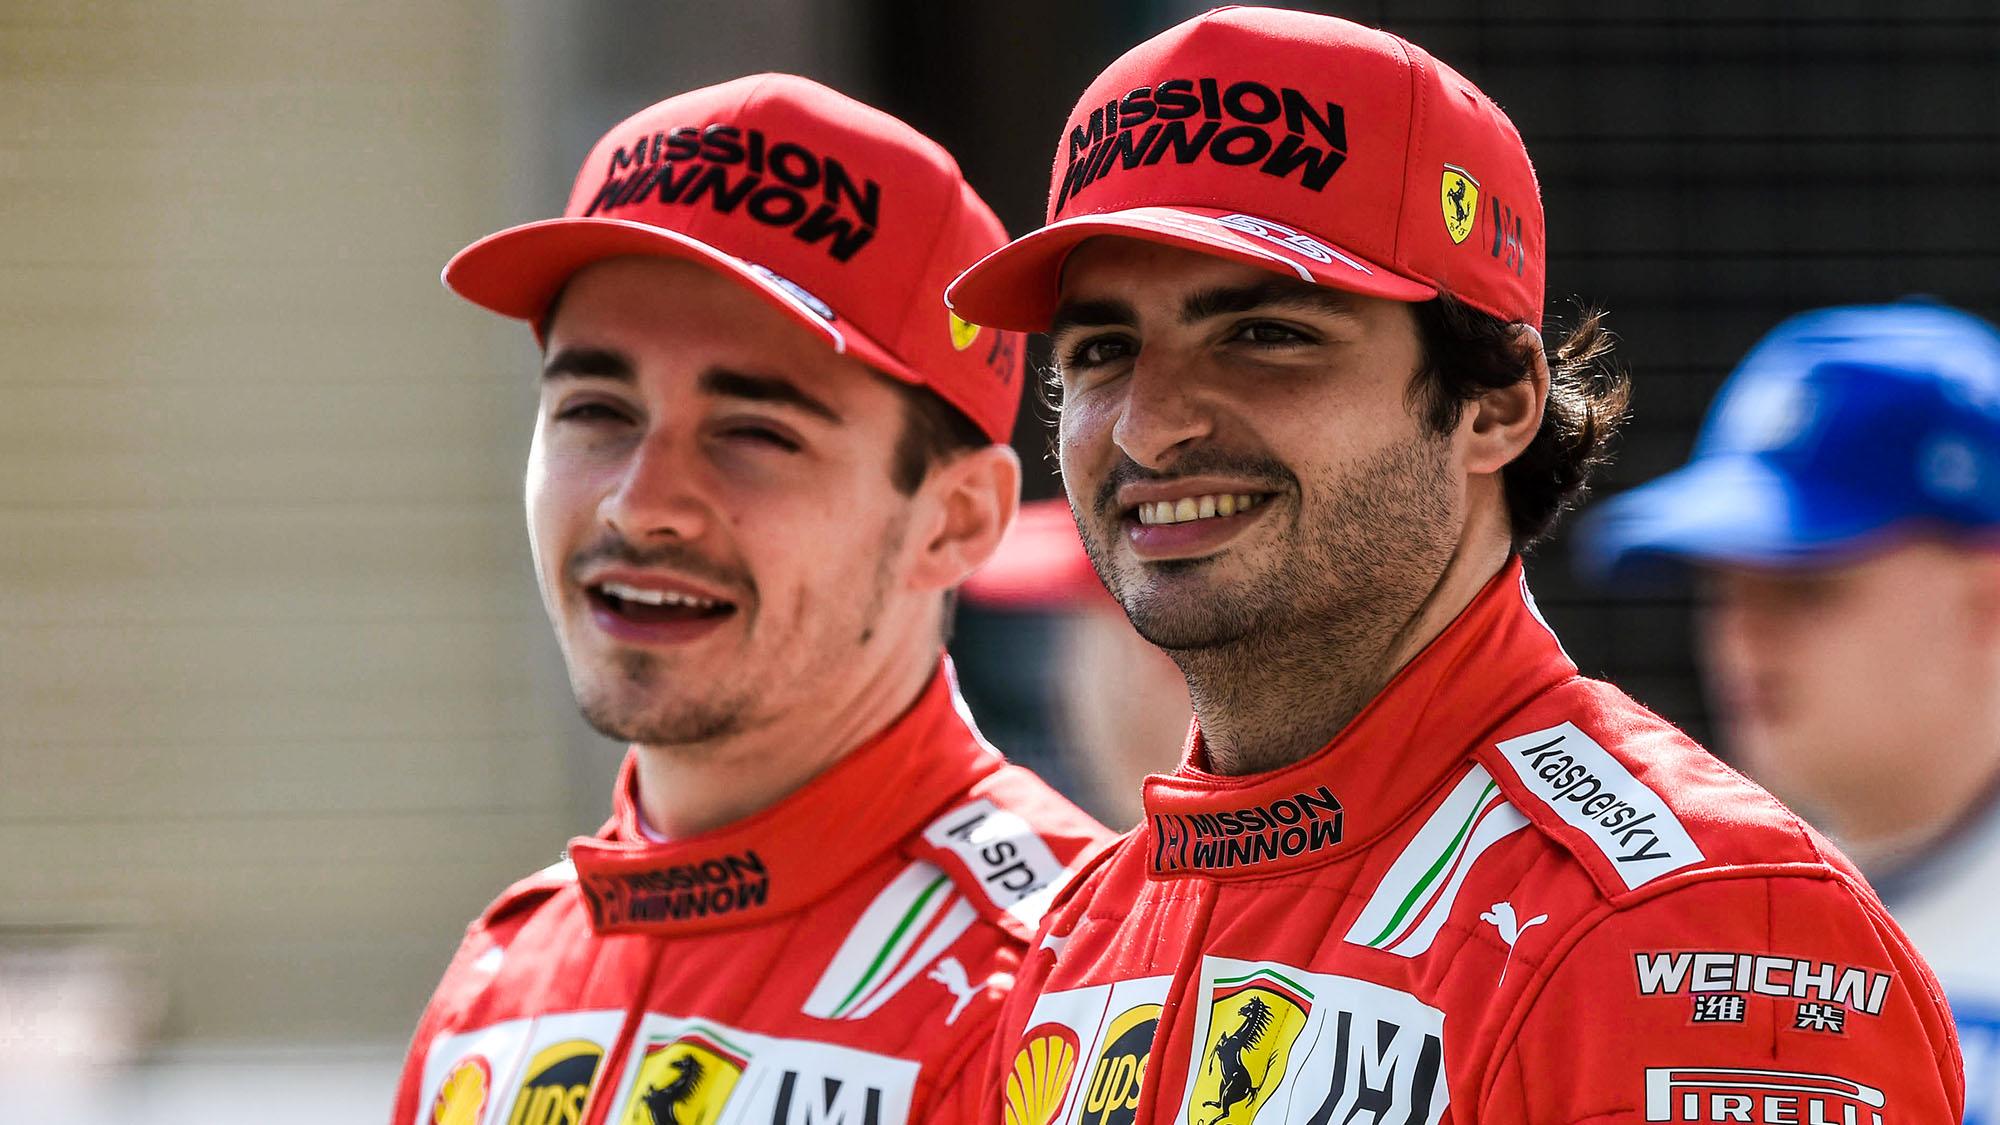 Charles Leclerc and Carlos Sainz in preseason testing